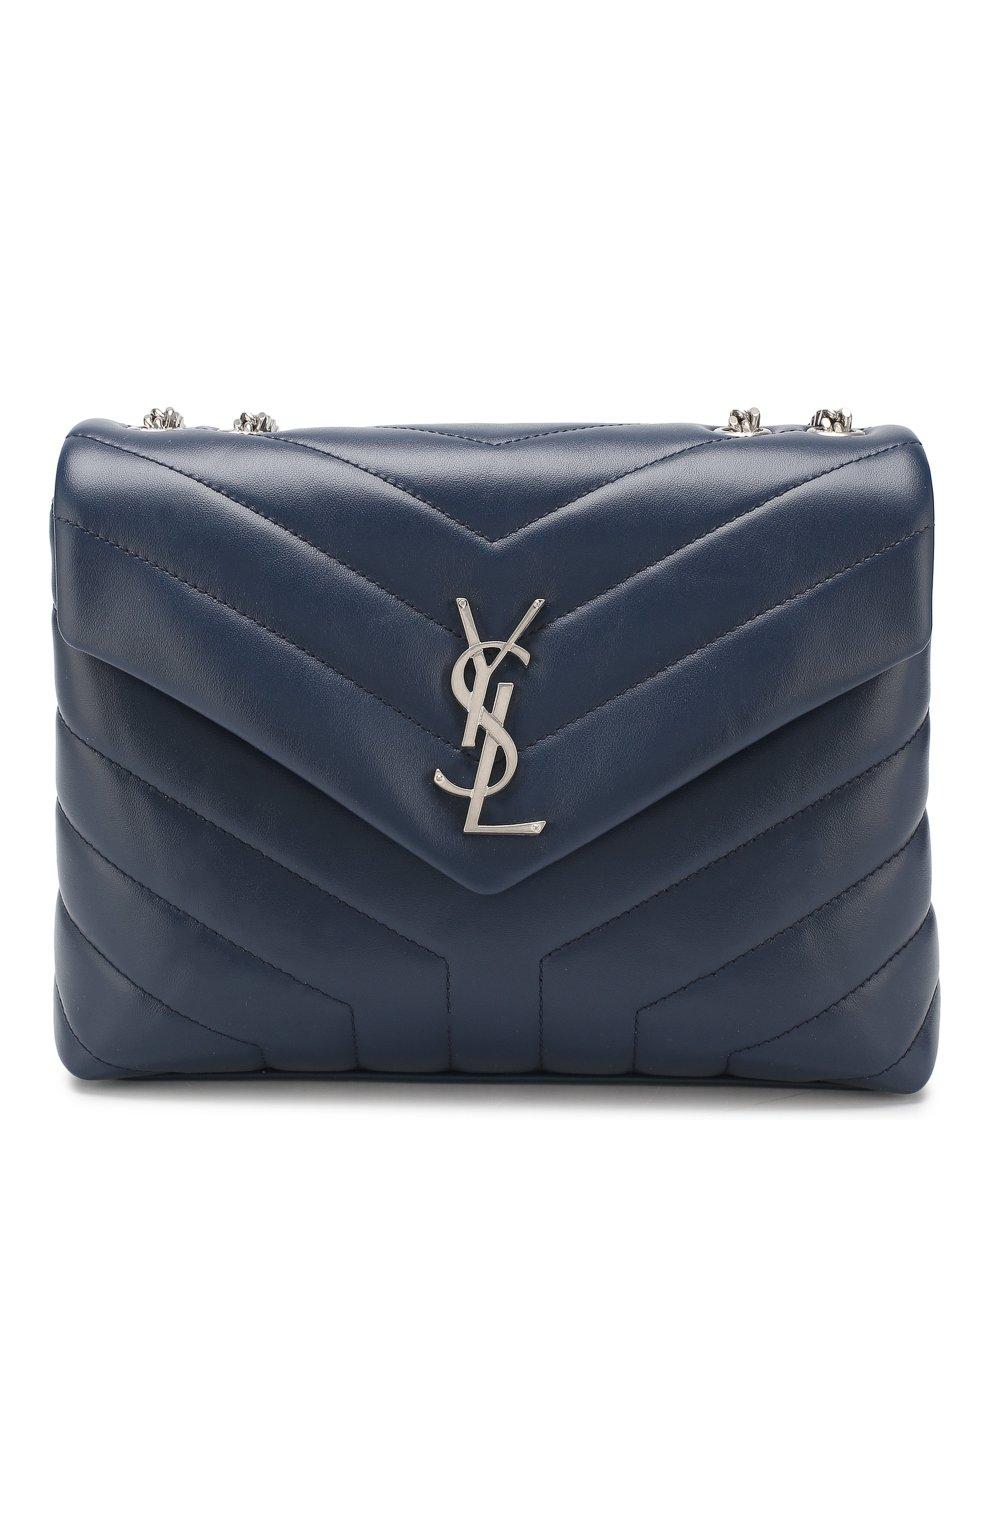 Женская сумка monogram loulou small SAINT LAURENT синего цвета, арт. 494699/DV726 | Фото 1